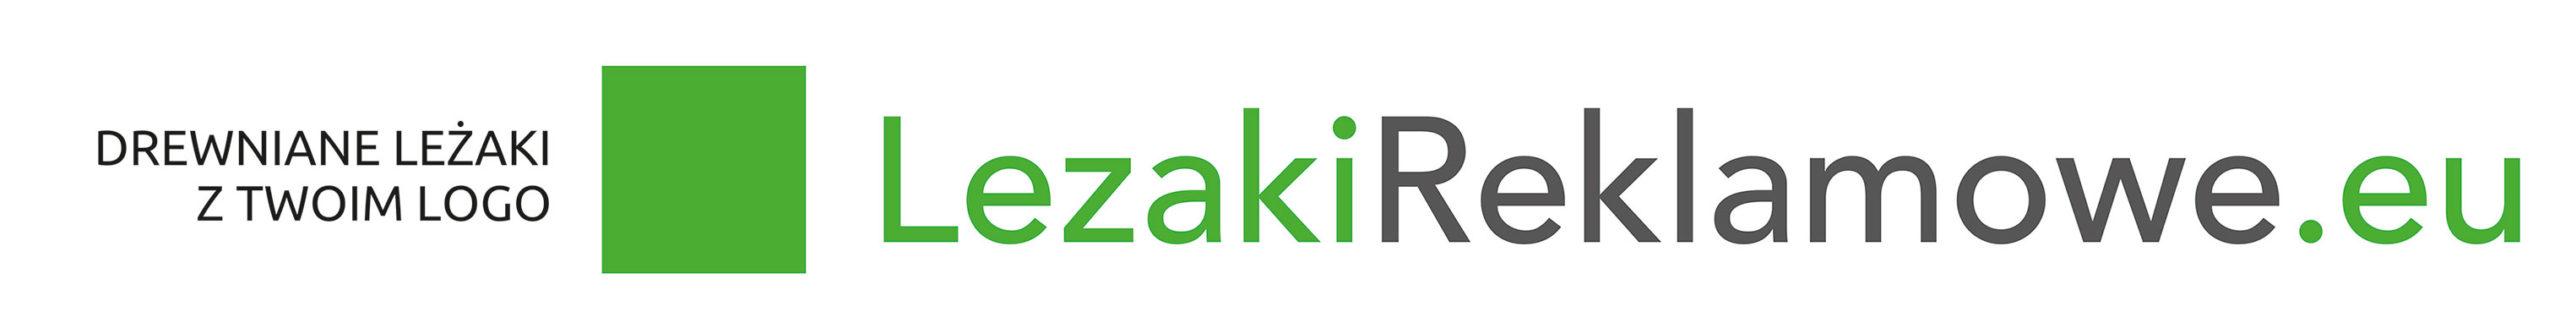 Leżaki reklamowe z logo – LezakiReklamowe.eu